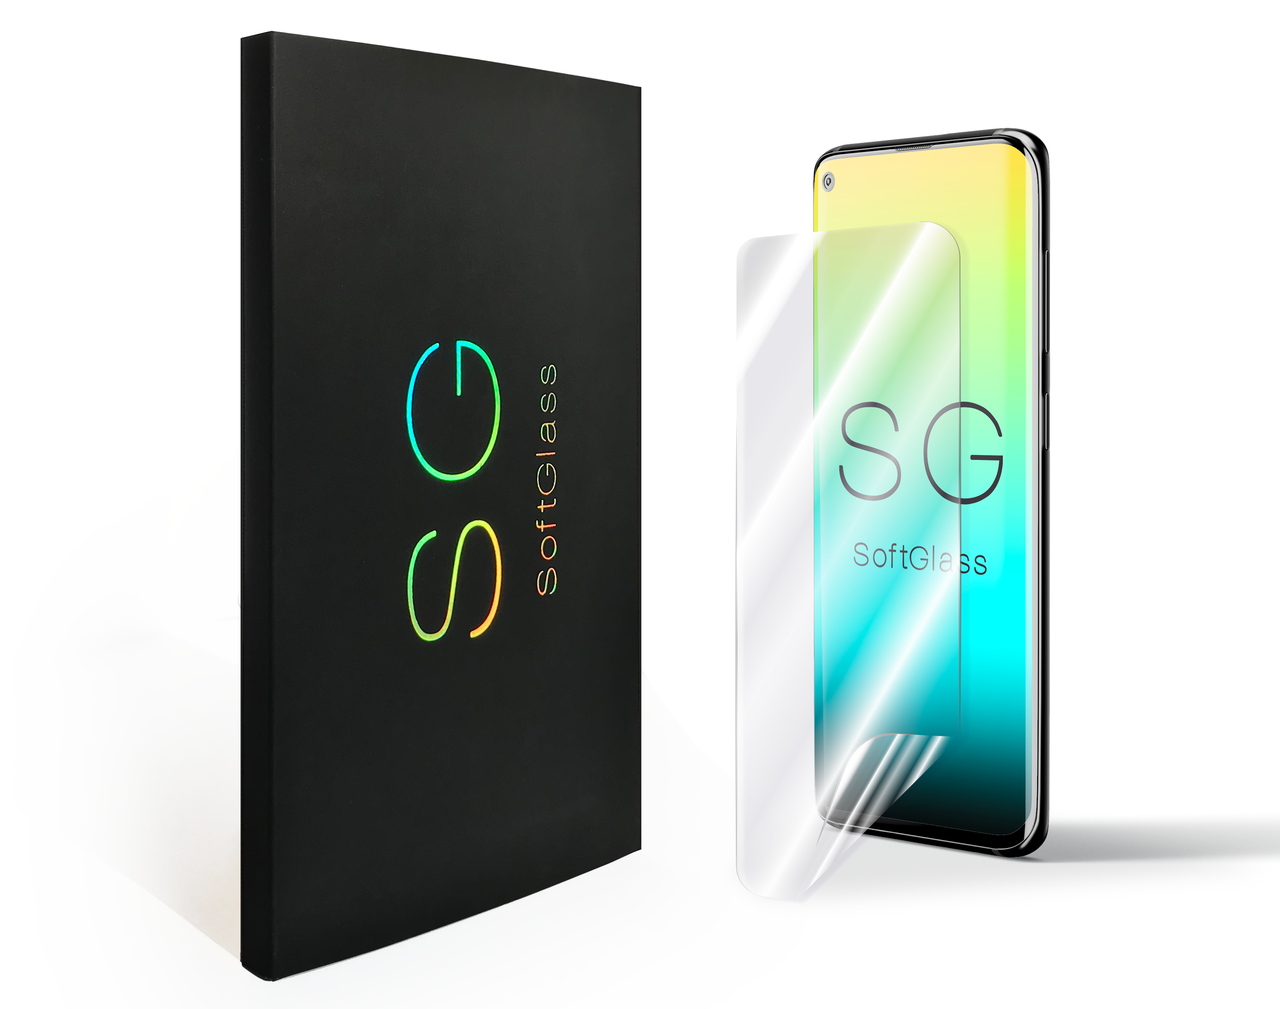 М'яке скло для Huawei Honor 3 SoftGlass Екран